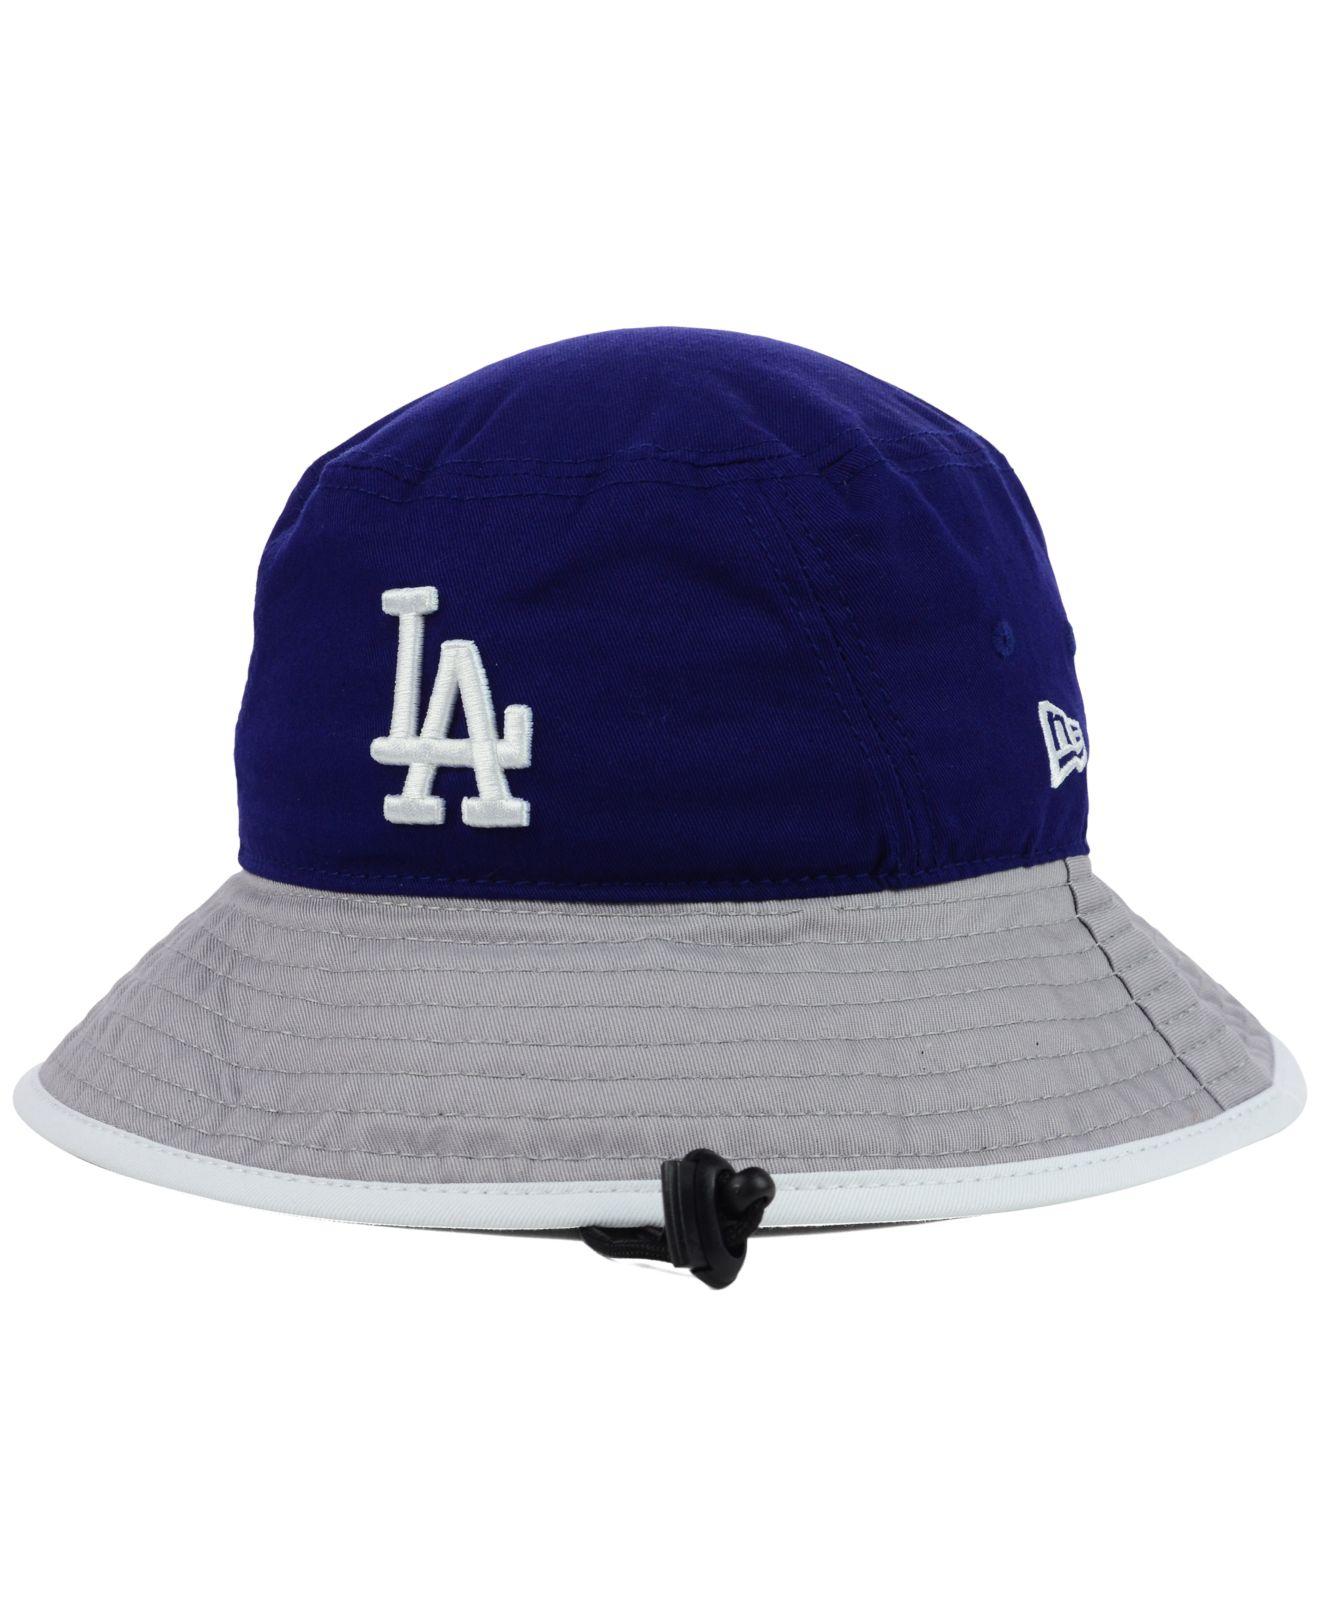 Lyst - KTZ Los Angeles Dodgers Tipped Bucket Hat in Blue for Men f559f27112c